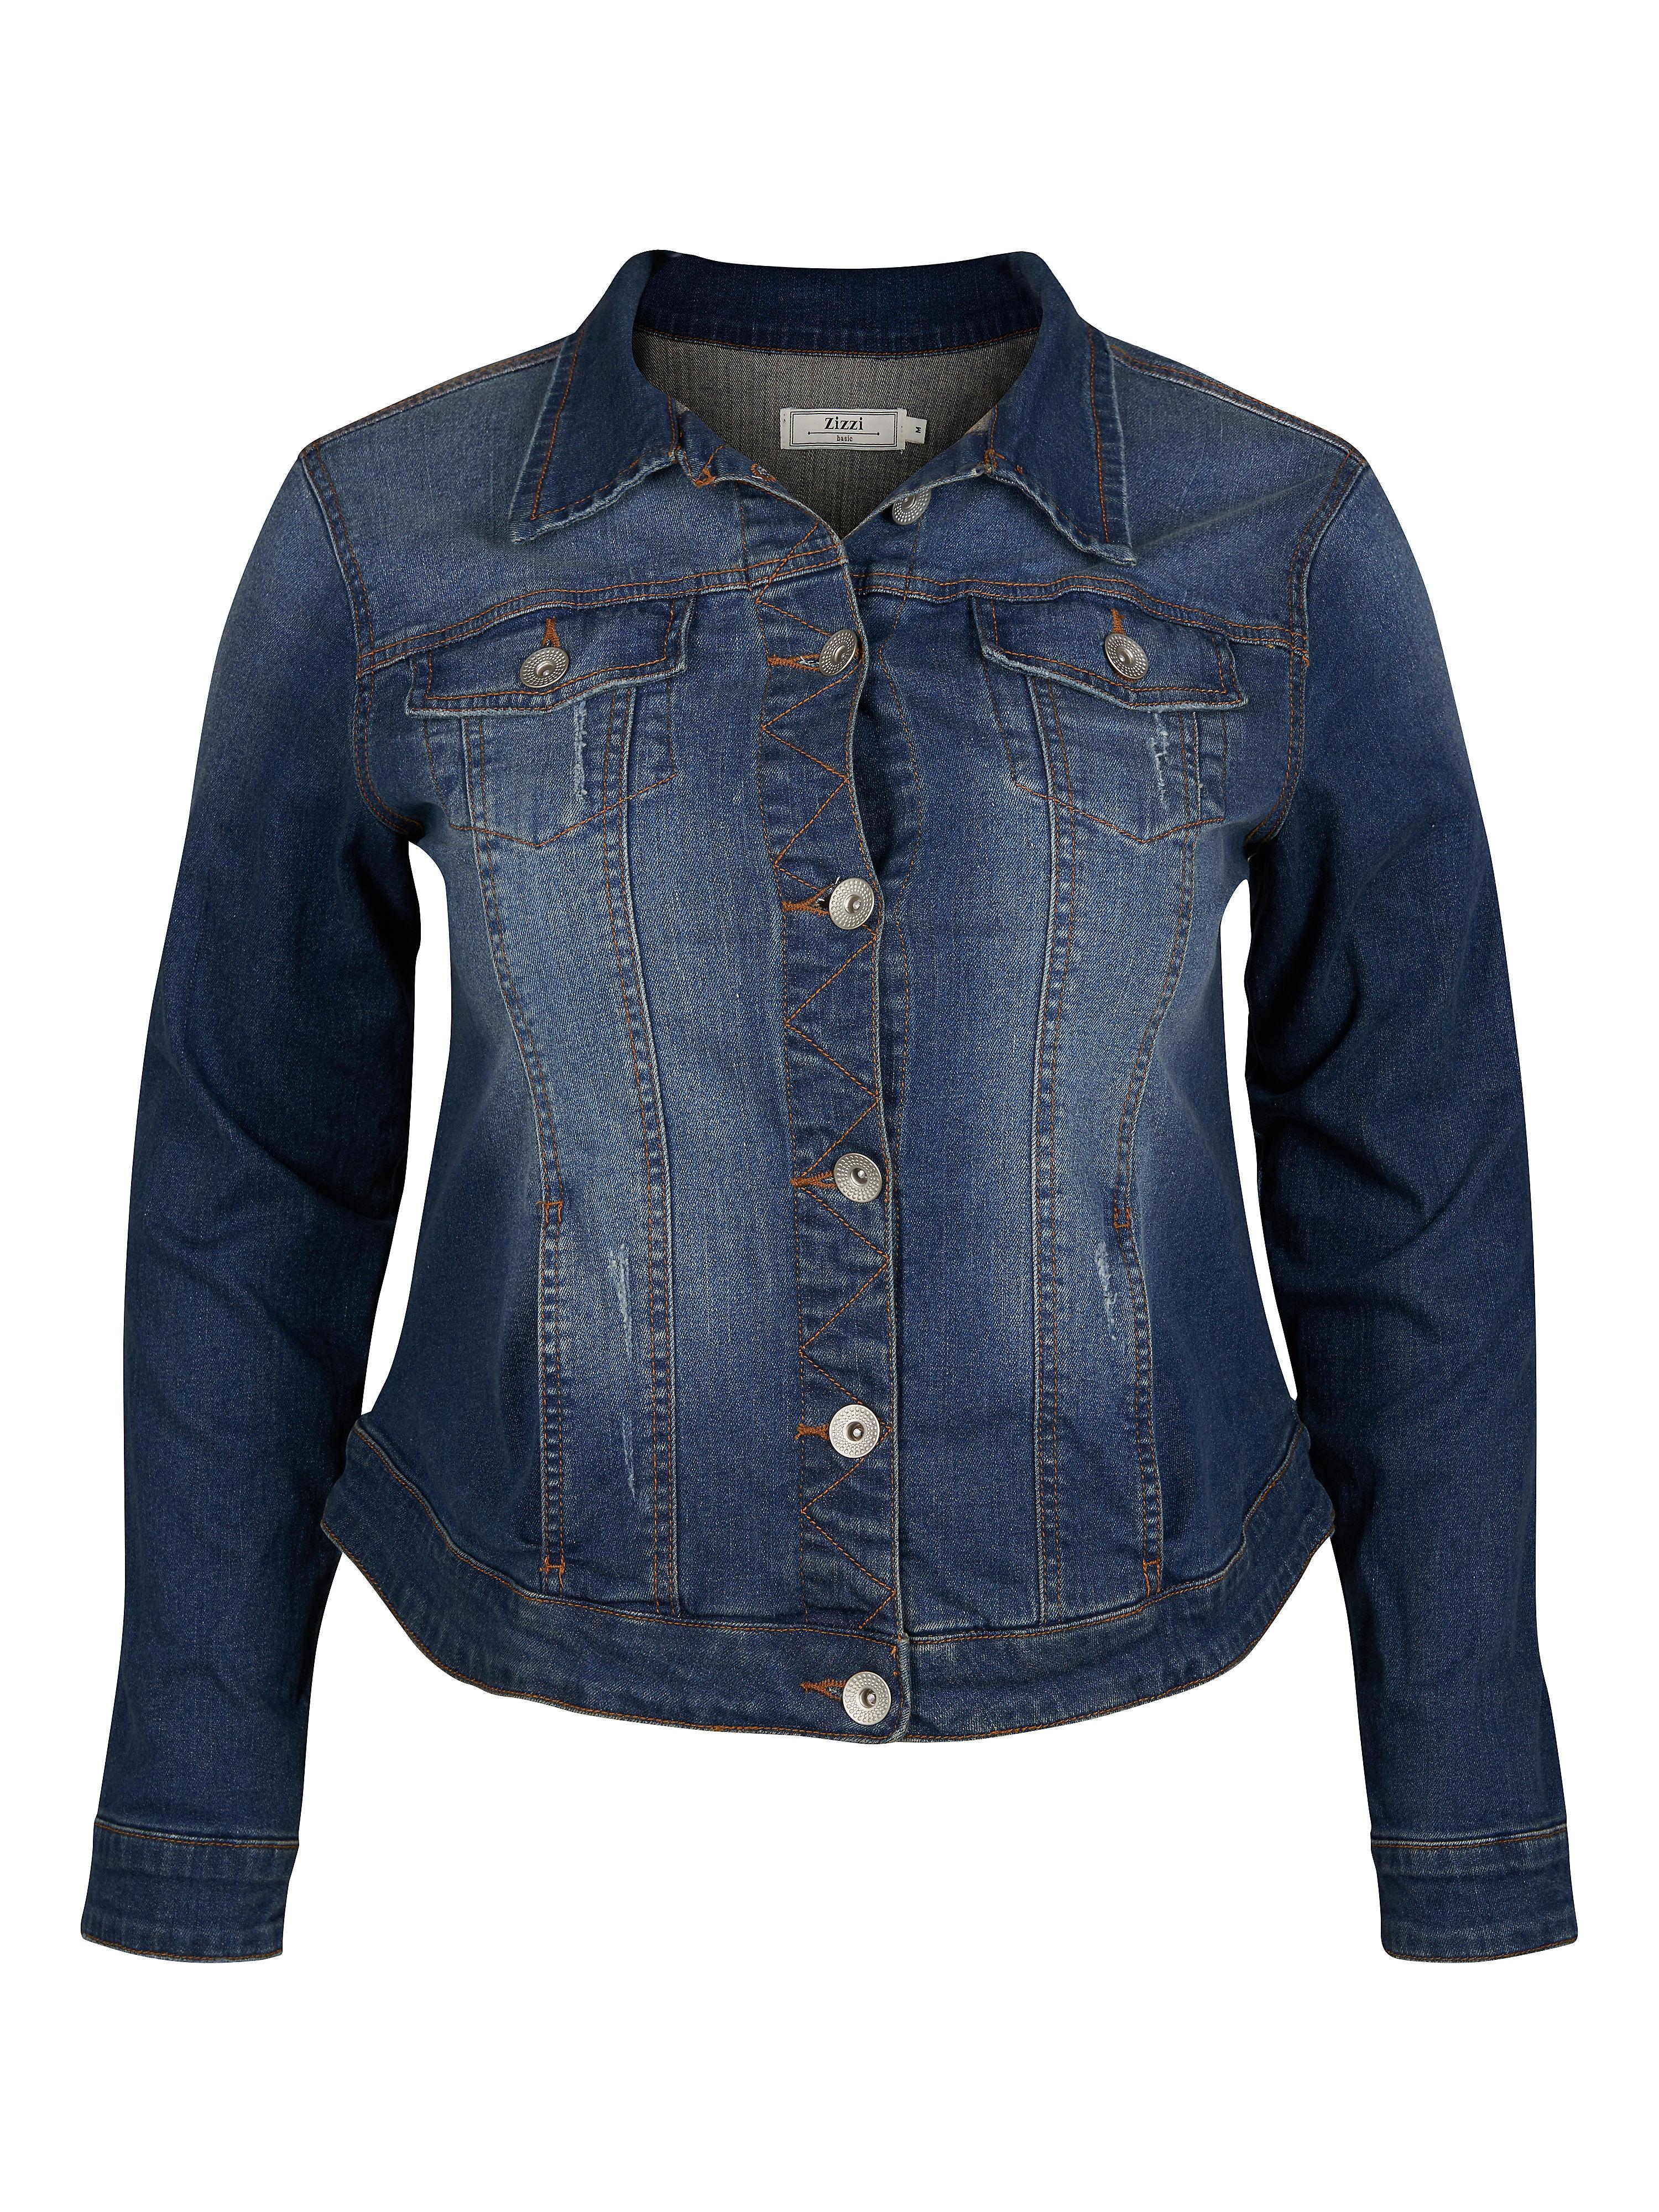 jeans-jakke-i-kort-form-from-zizzi-blue